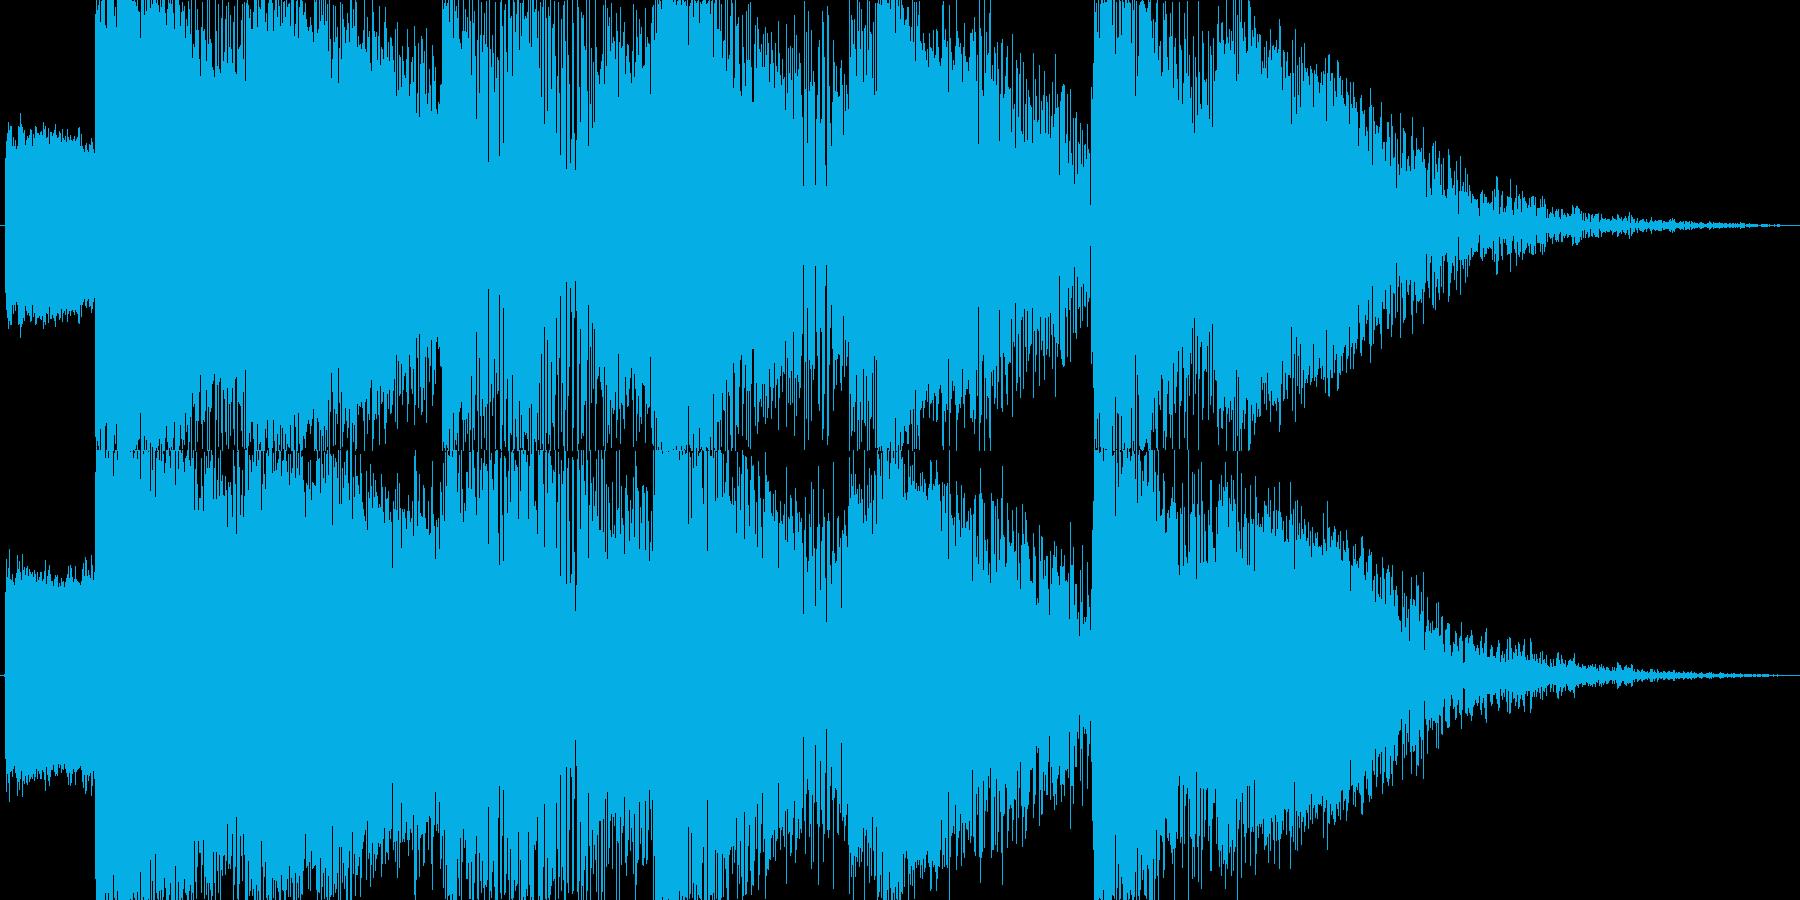 【SE】爆発音04(超爆発)の再生済みの波形